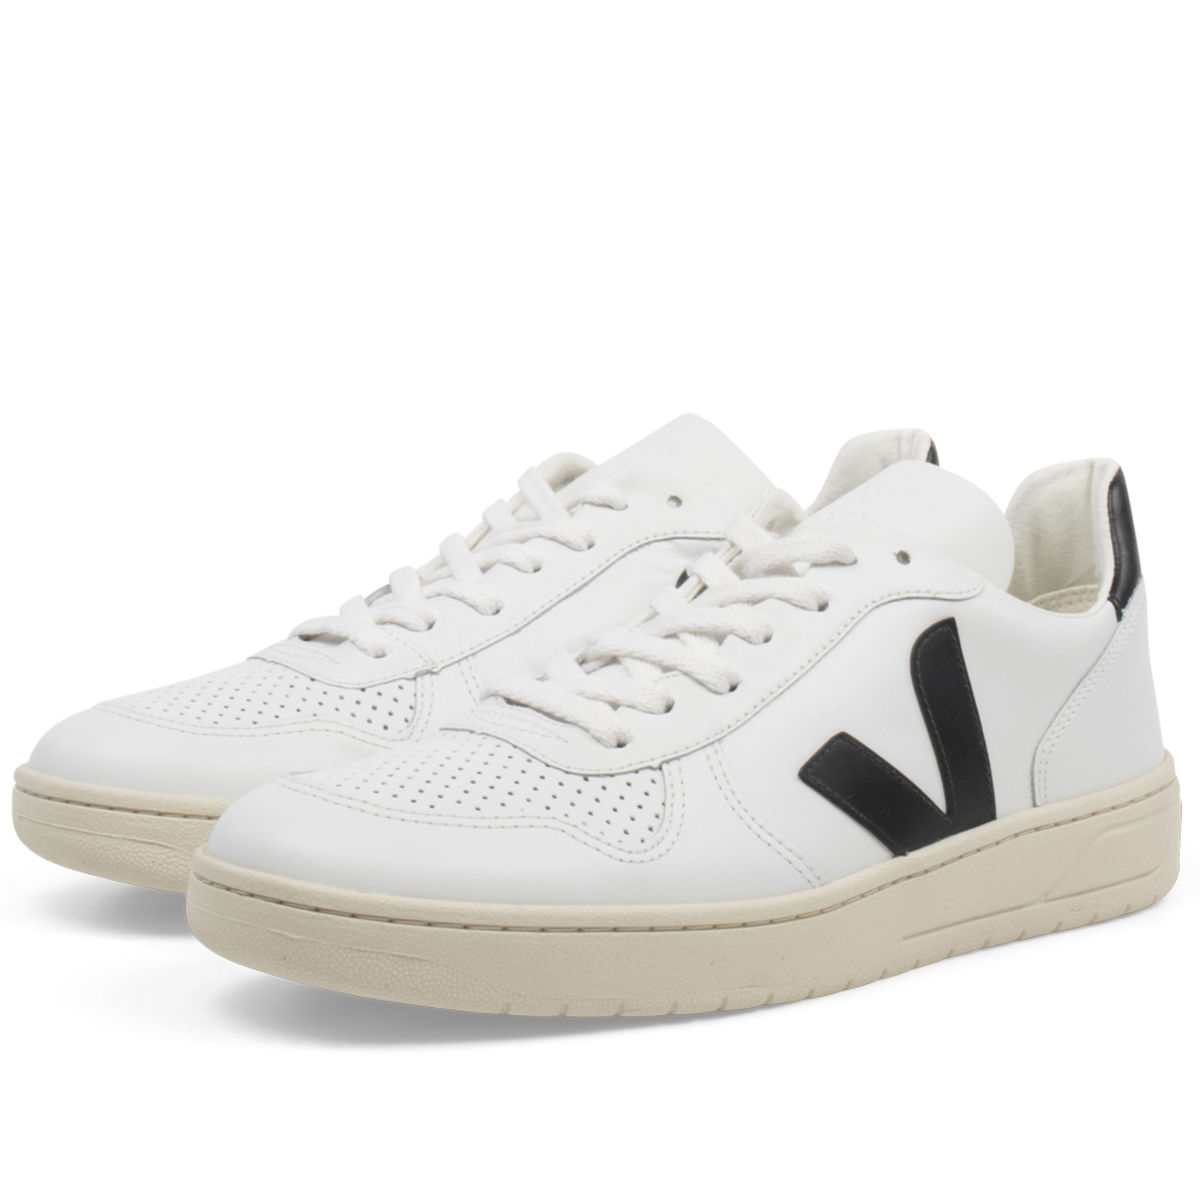 unisex Veja v10 leather sneaker - Extra